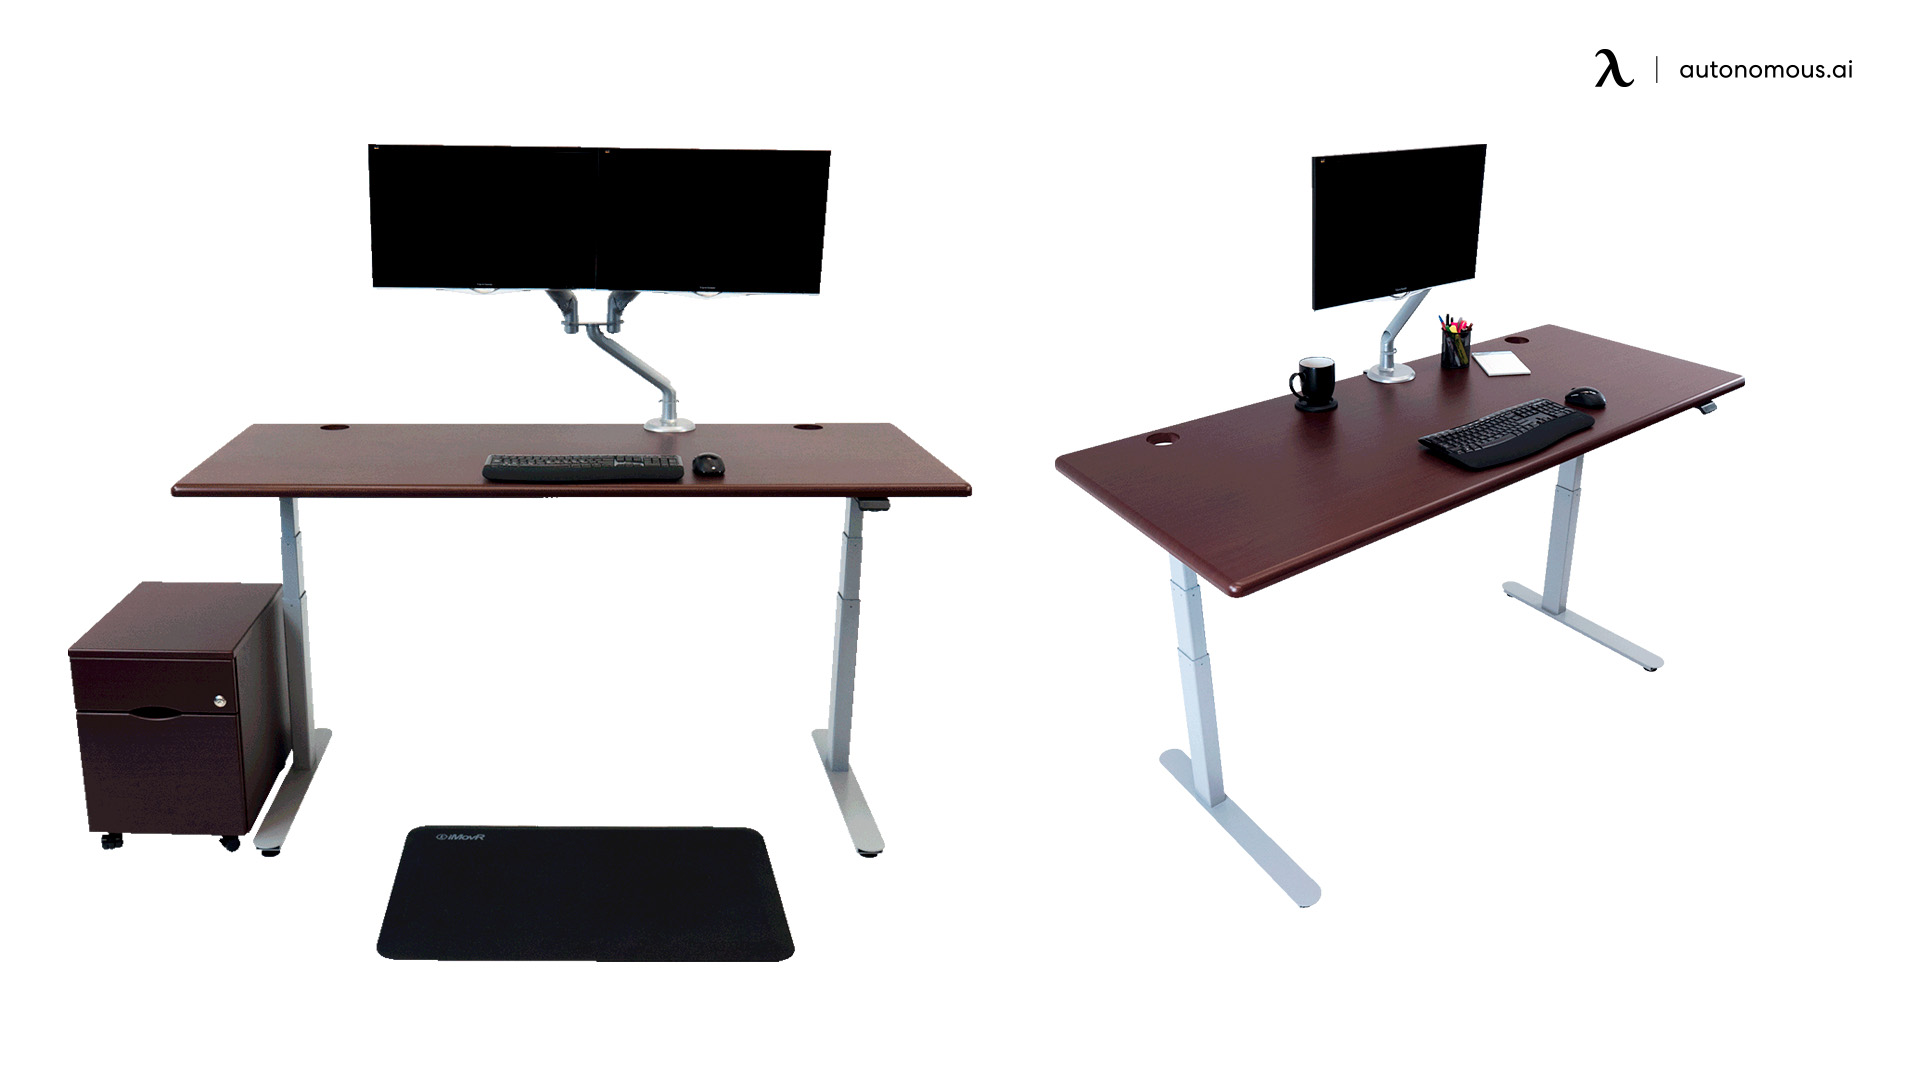 iMovR Lander Modern Standing Desk